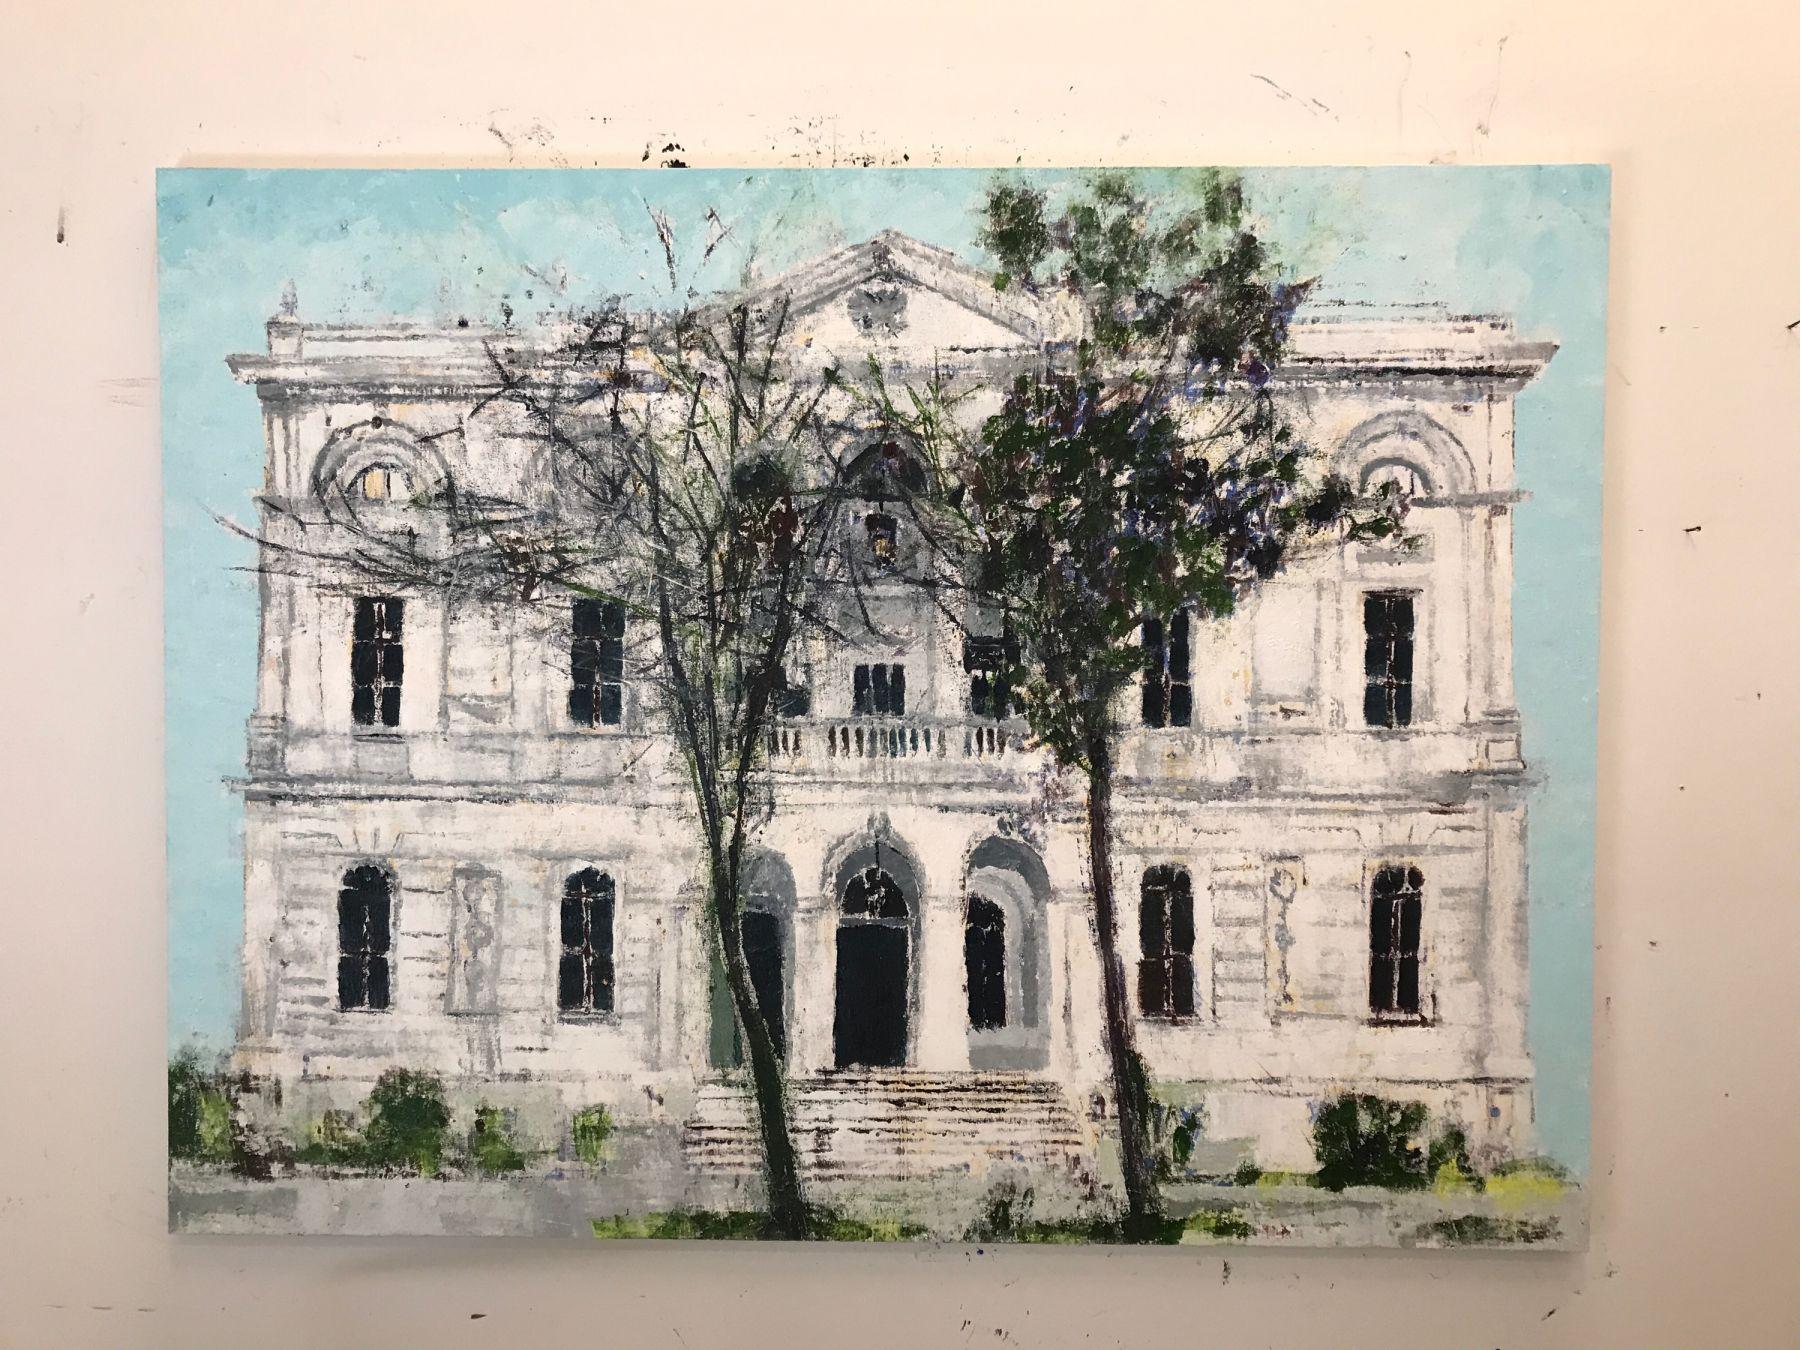 Enoc Perez Soho House Istanbul, 2017